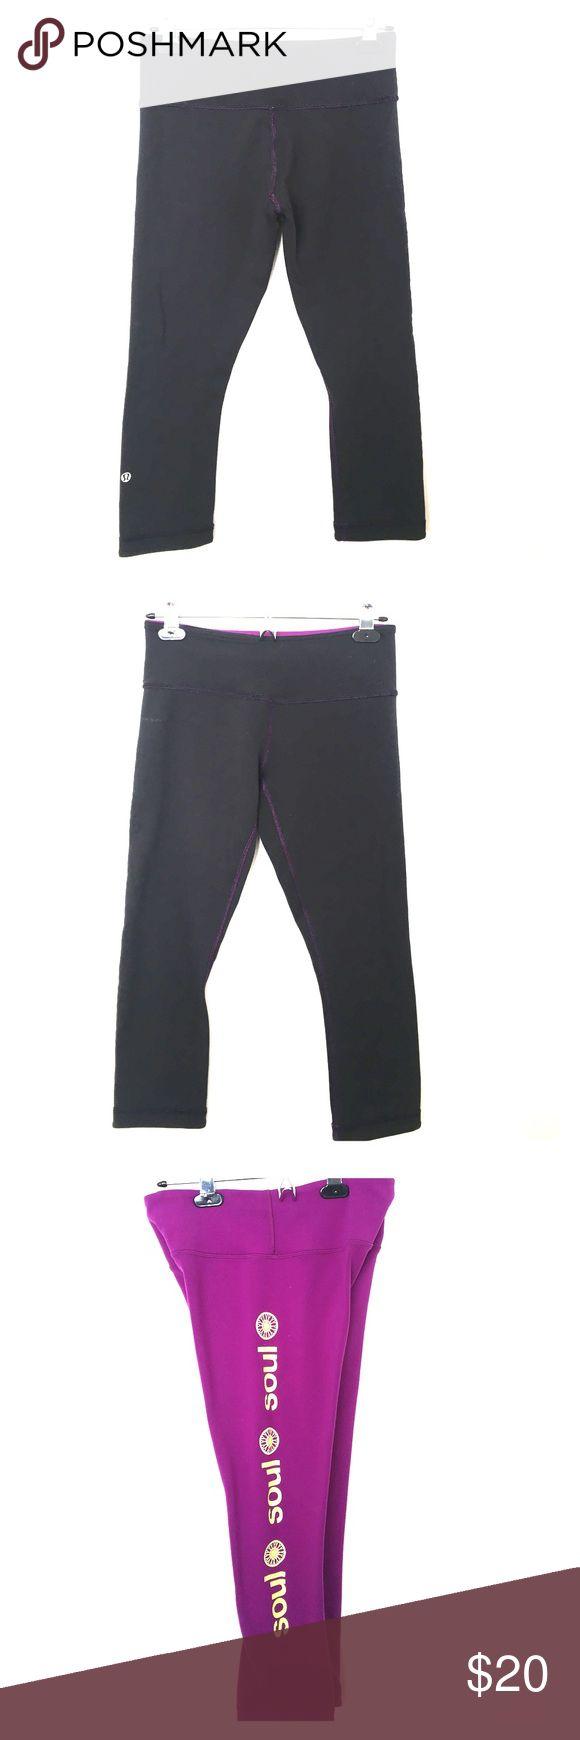 LuluLemon Athletica Reversible Yoga Pants LuluLemon Athletica SoulCycle Edition Reversible Yoga Pants lululemon athletica Pants Track Pants & Joggers